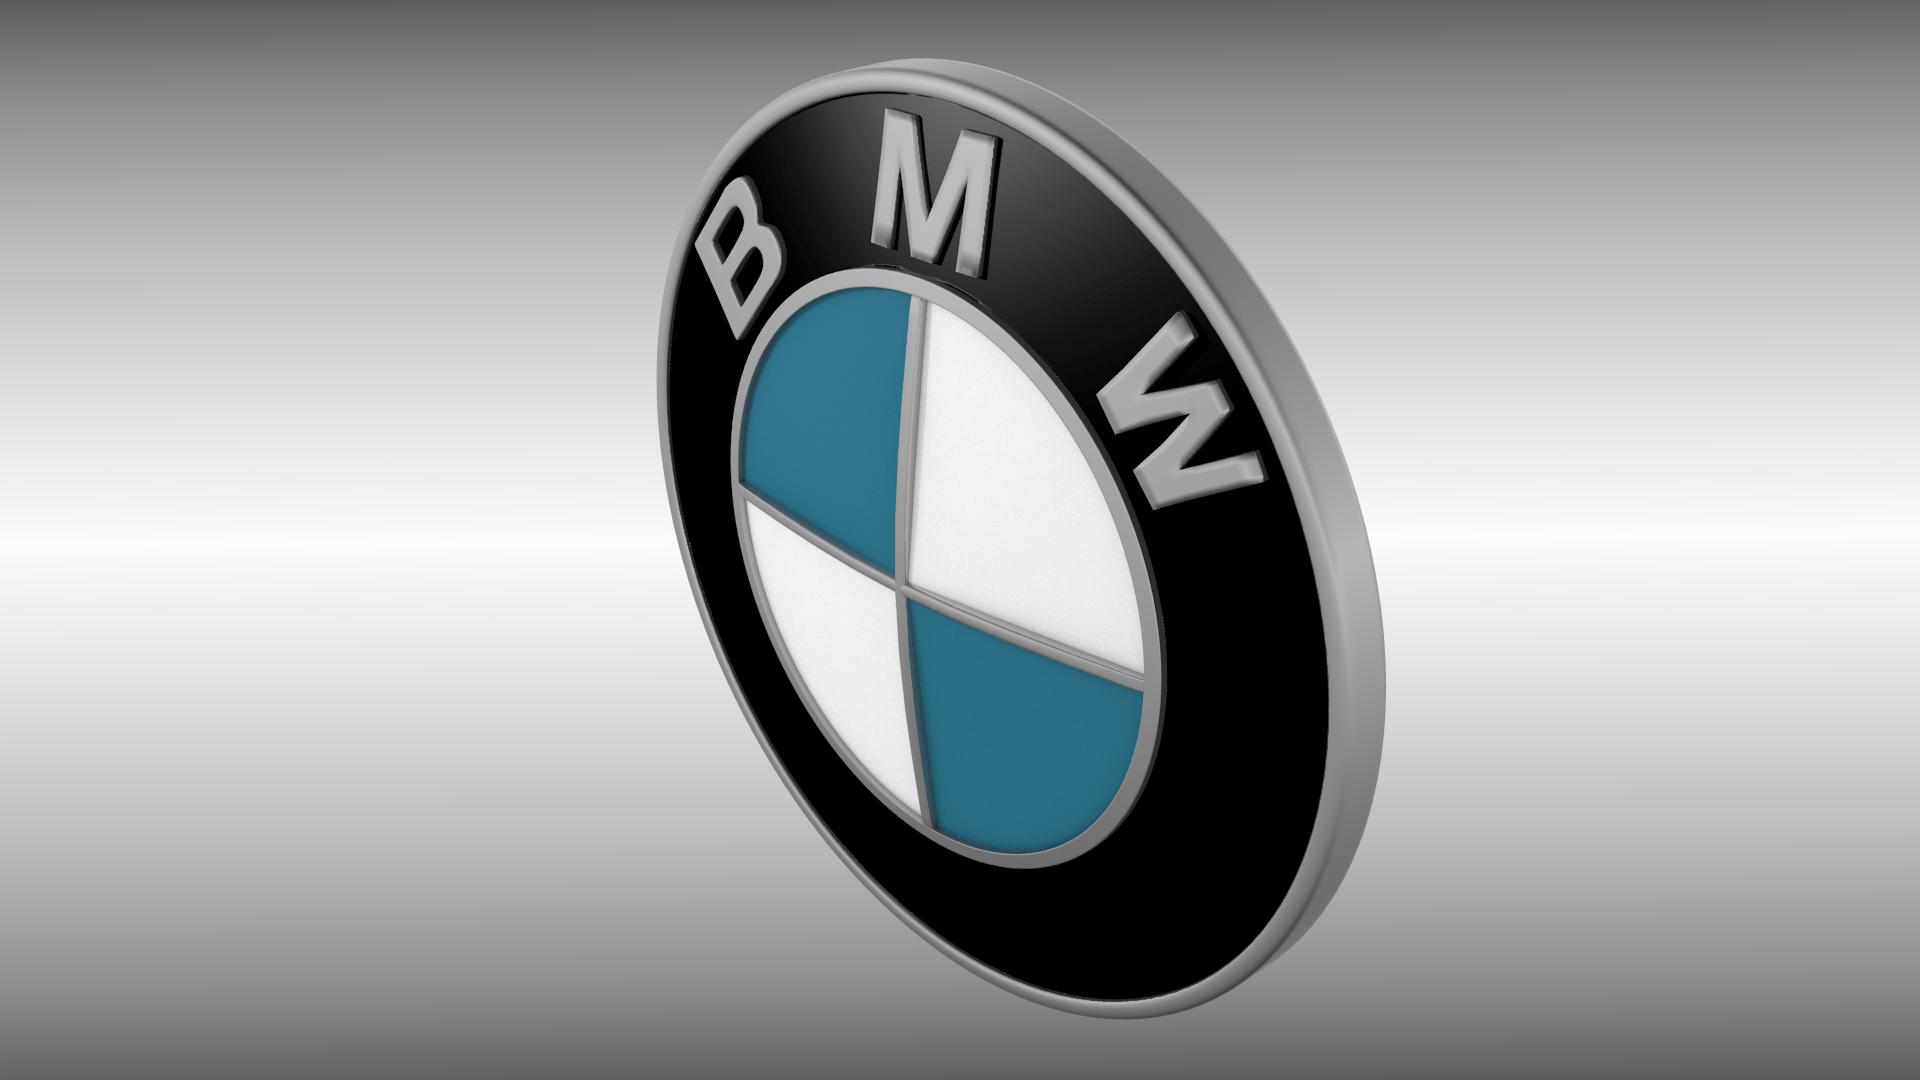 Full Hd Car Wallpapers 1080p Bmw Bmw Logo 3d Model Obj Blend Mtl Cgtrader Com